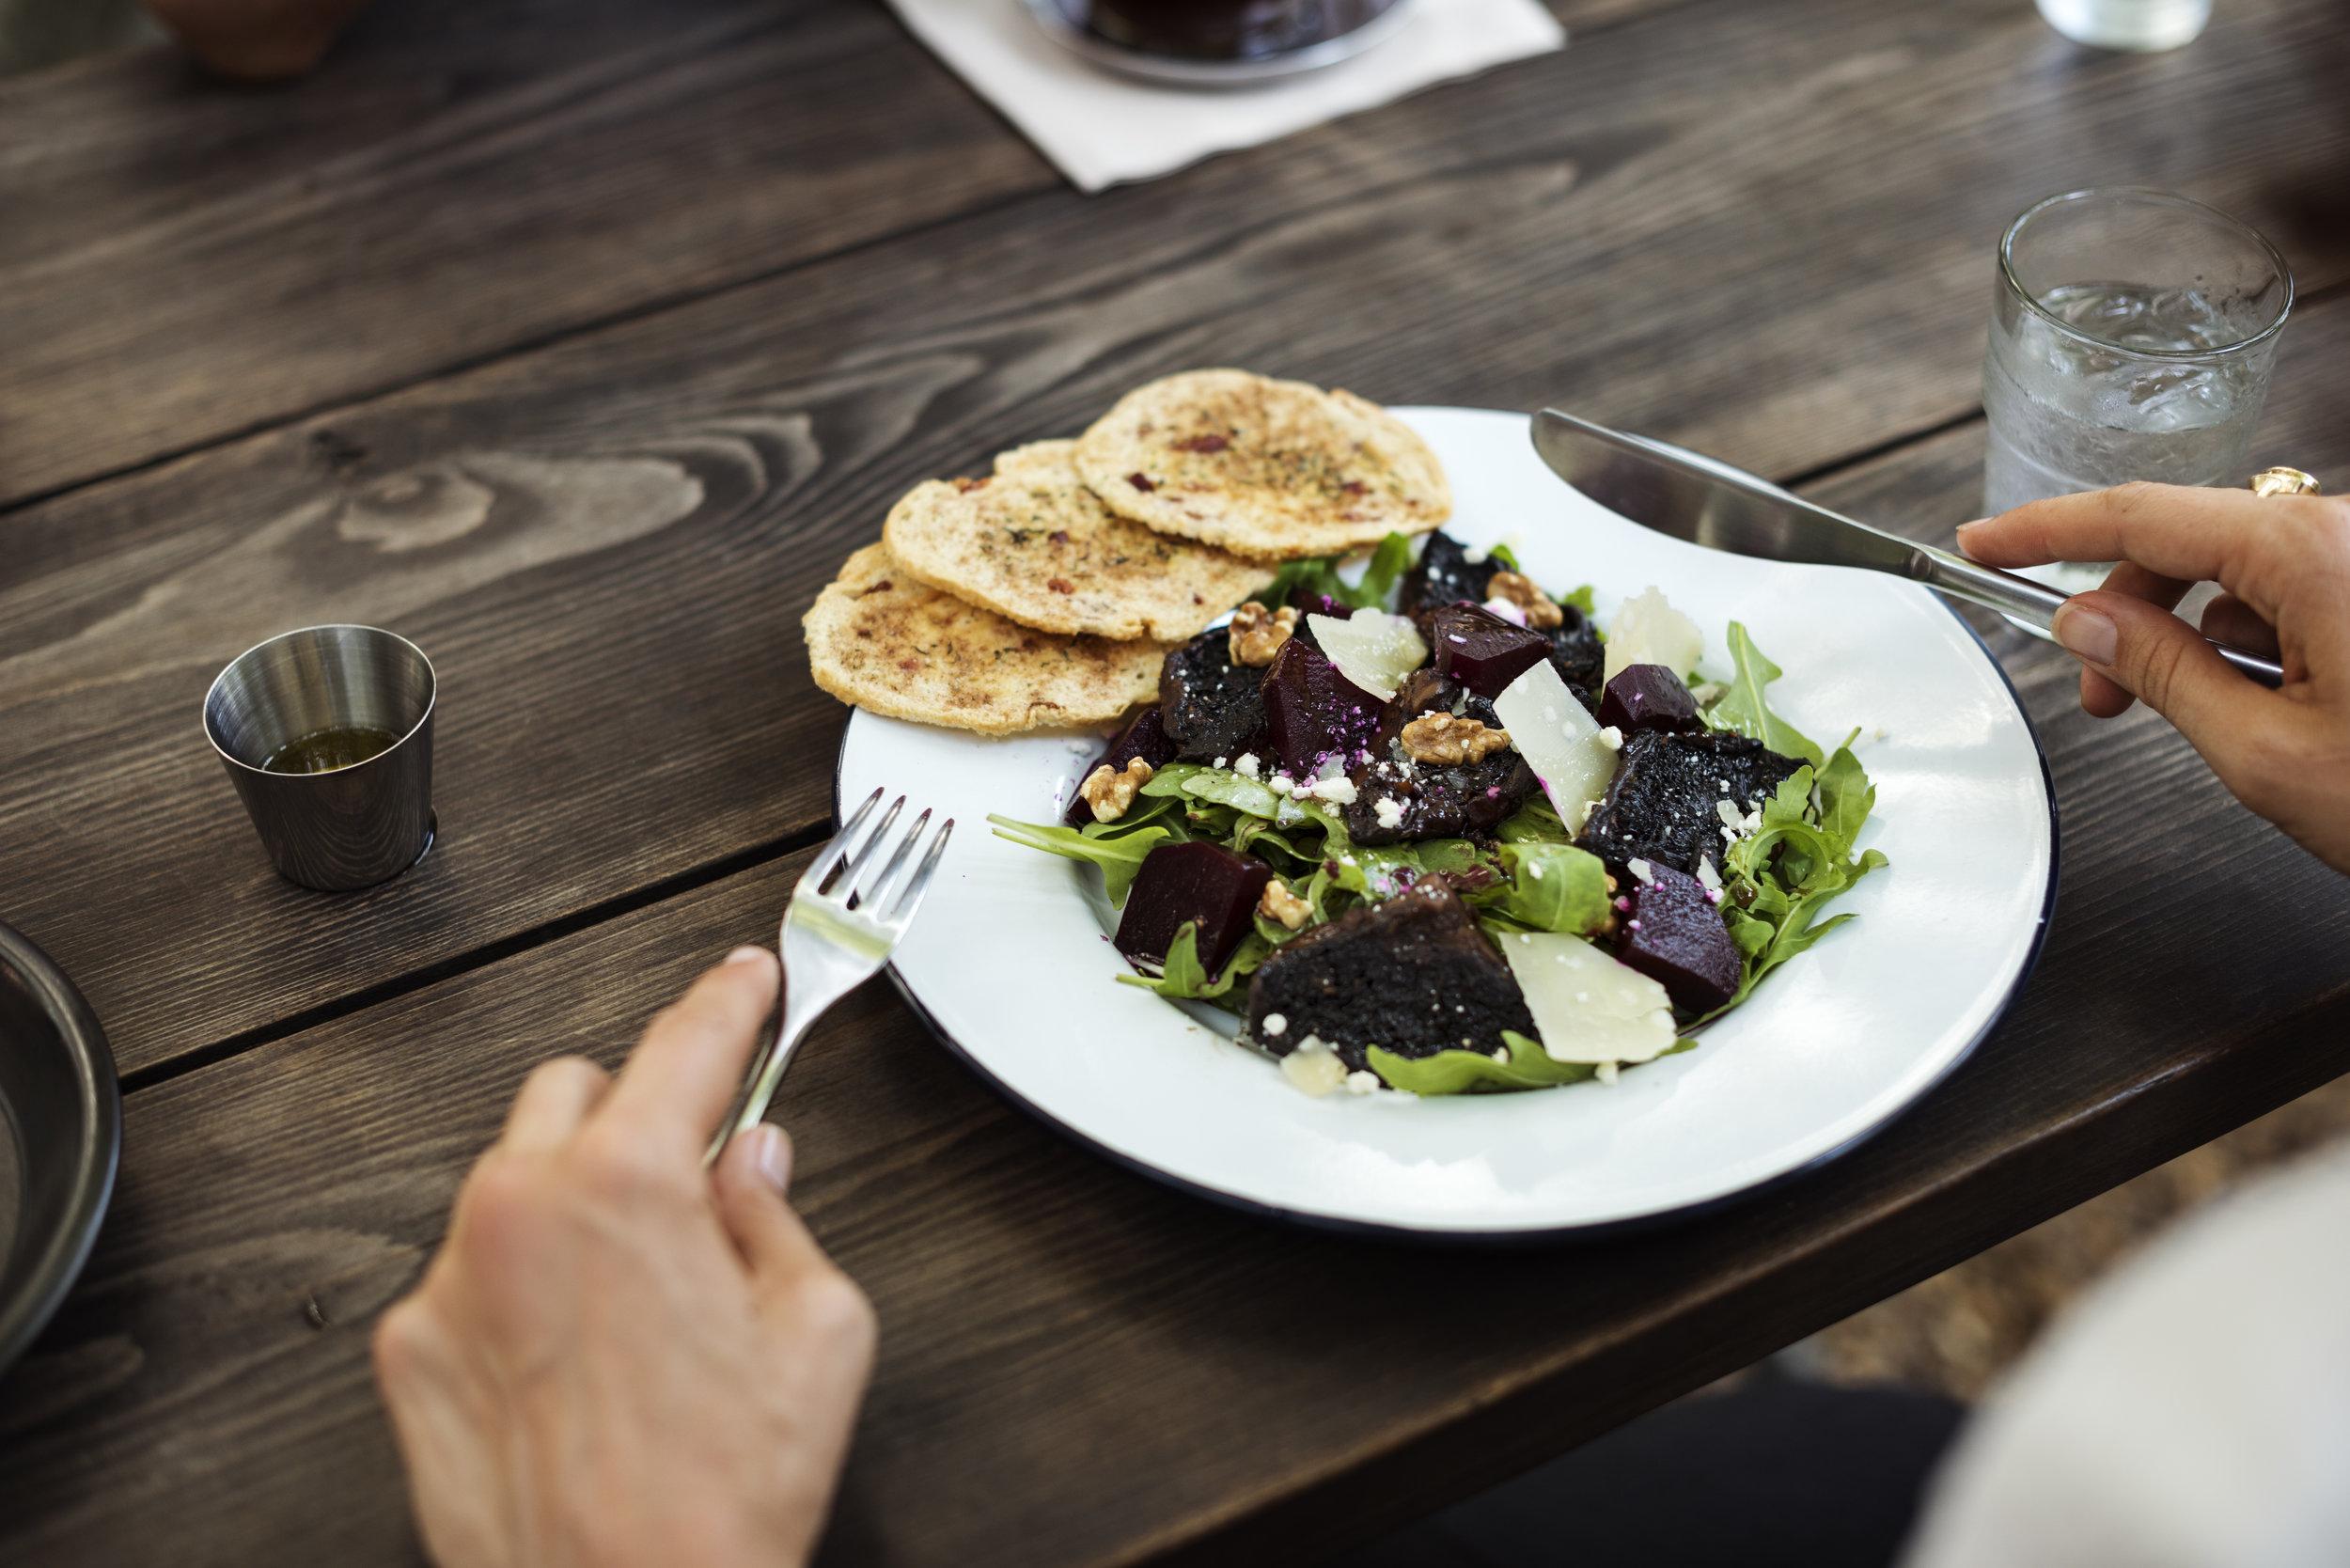 Beet and arugula salad with shredded pumpkin seed parmesan